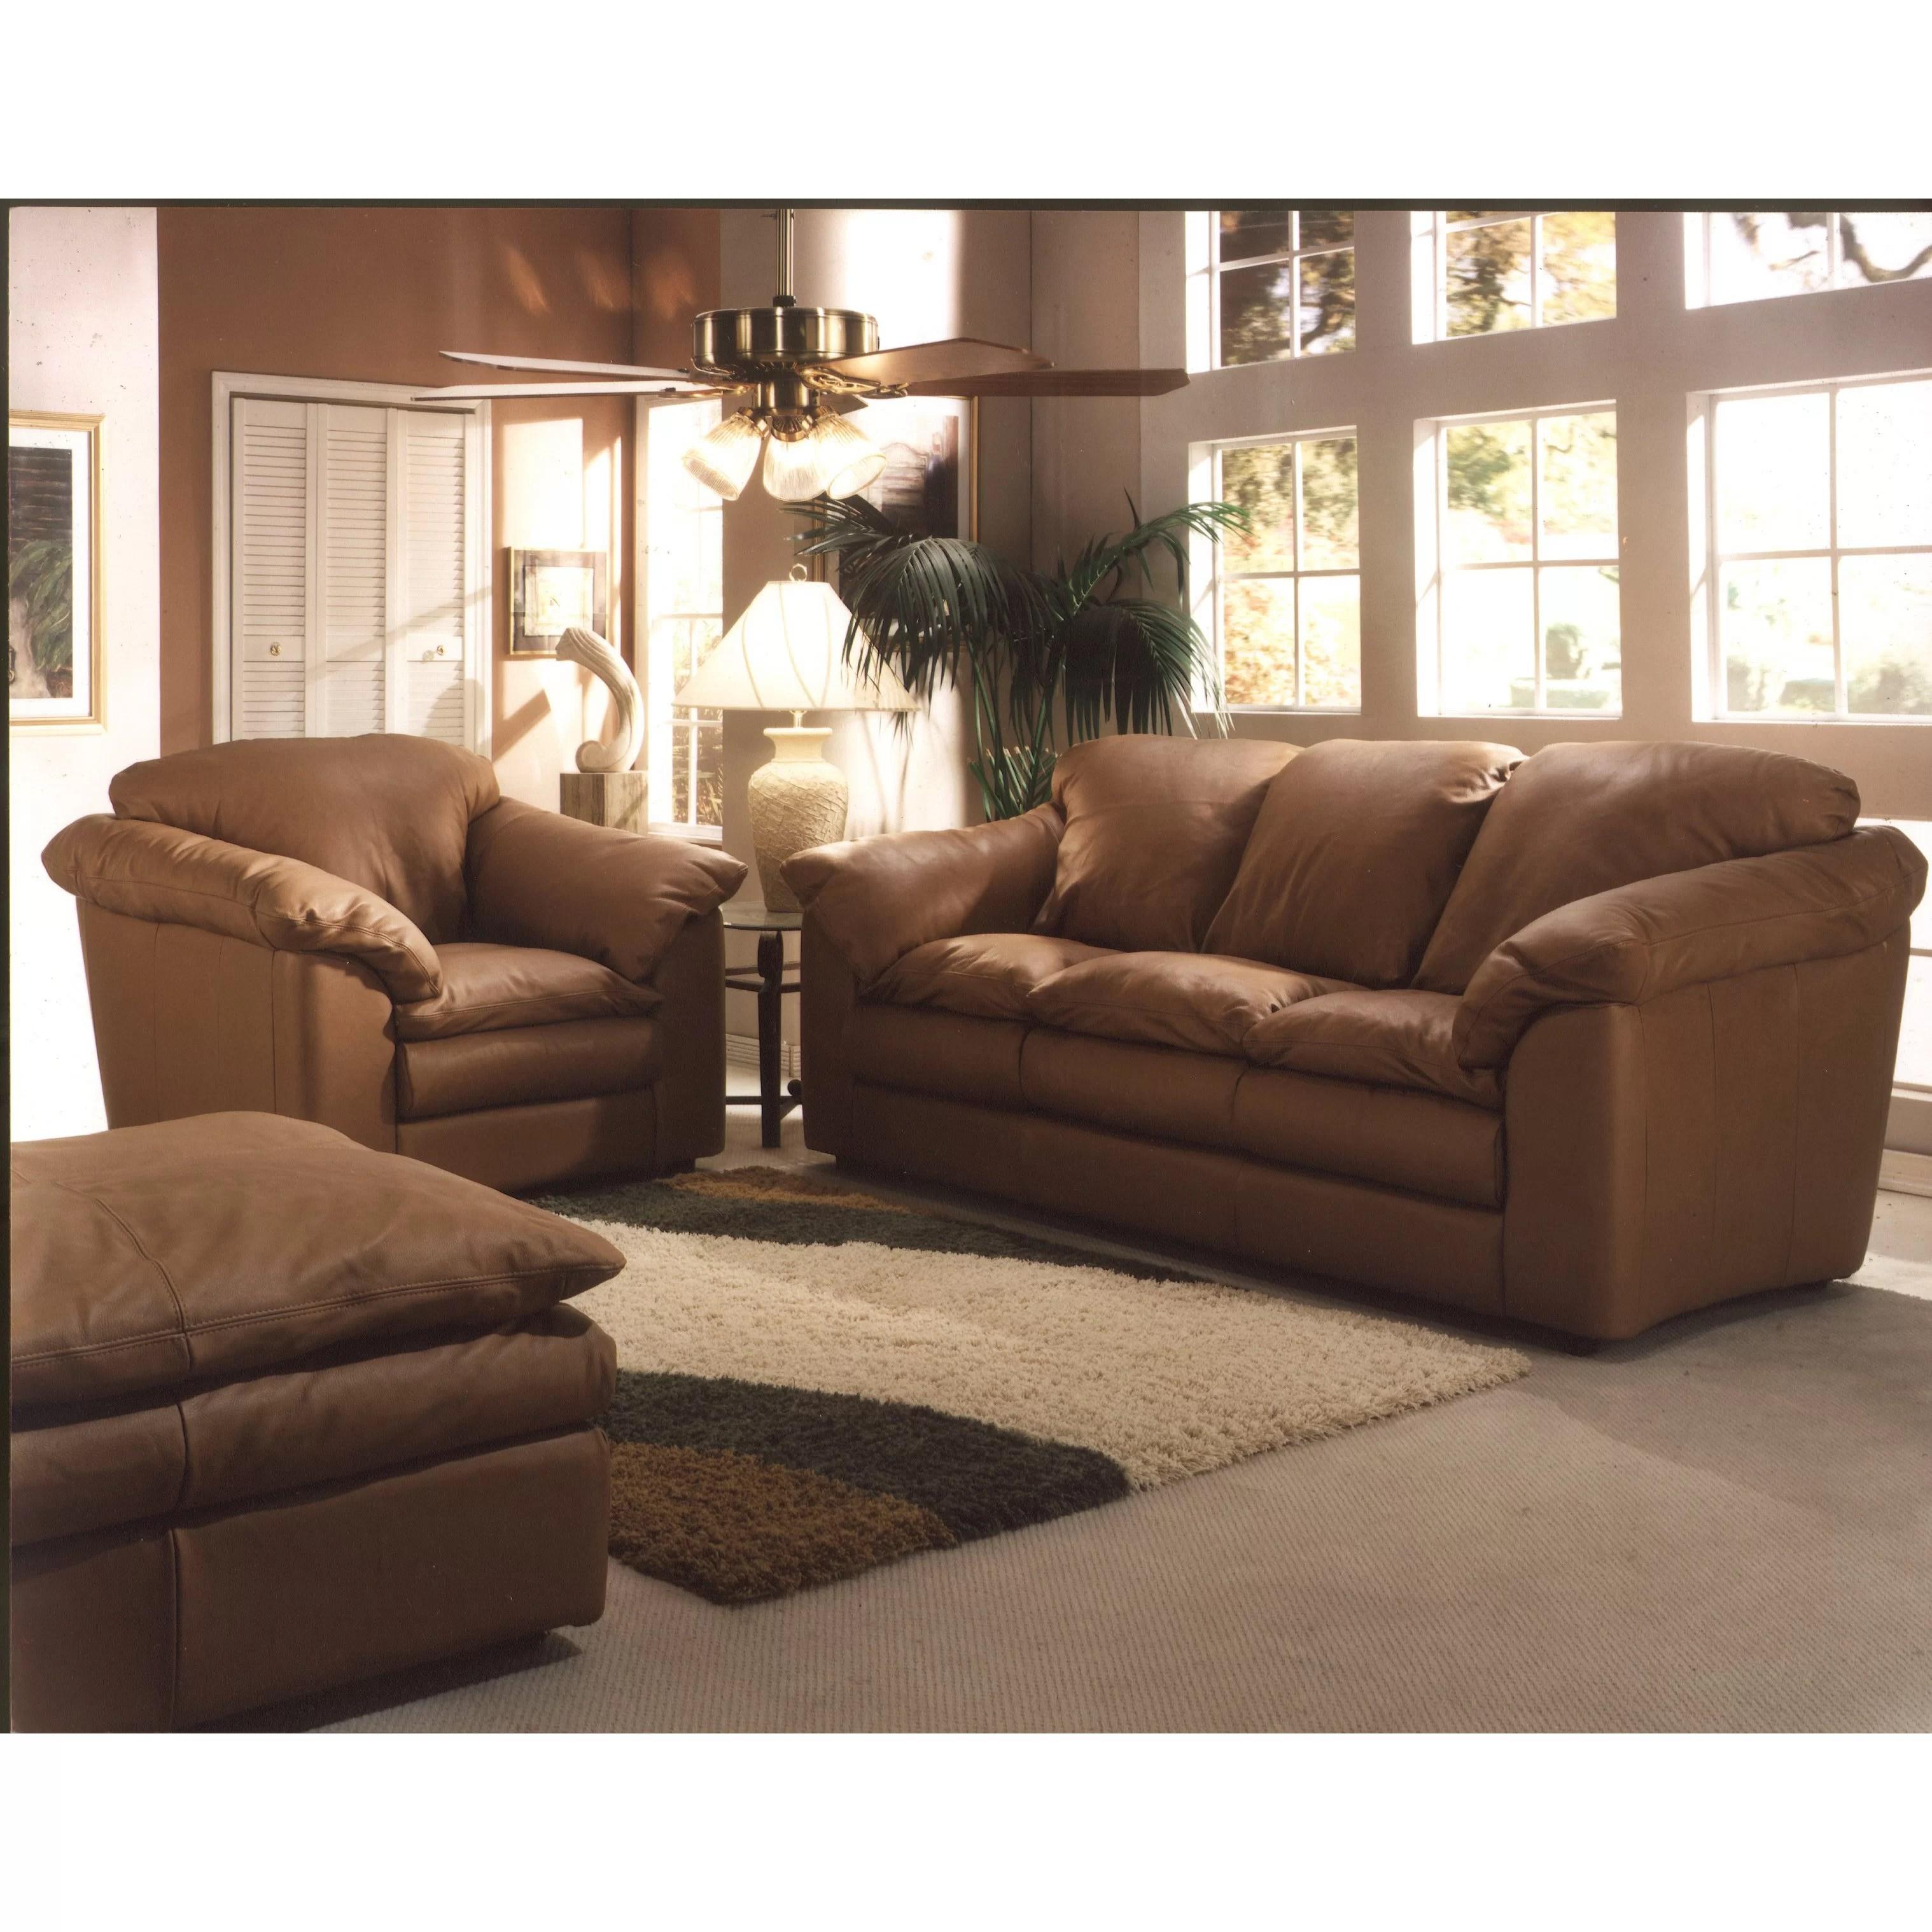 Omnia Leather Oregon 3 Seat Leather Living Room Set  Reviews  Wayfair